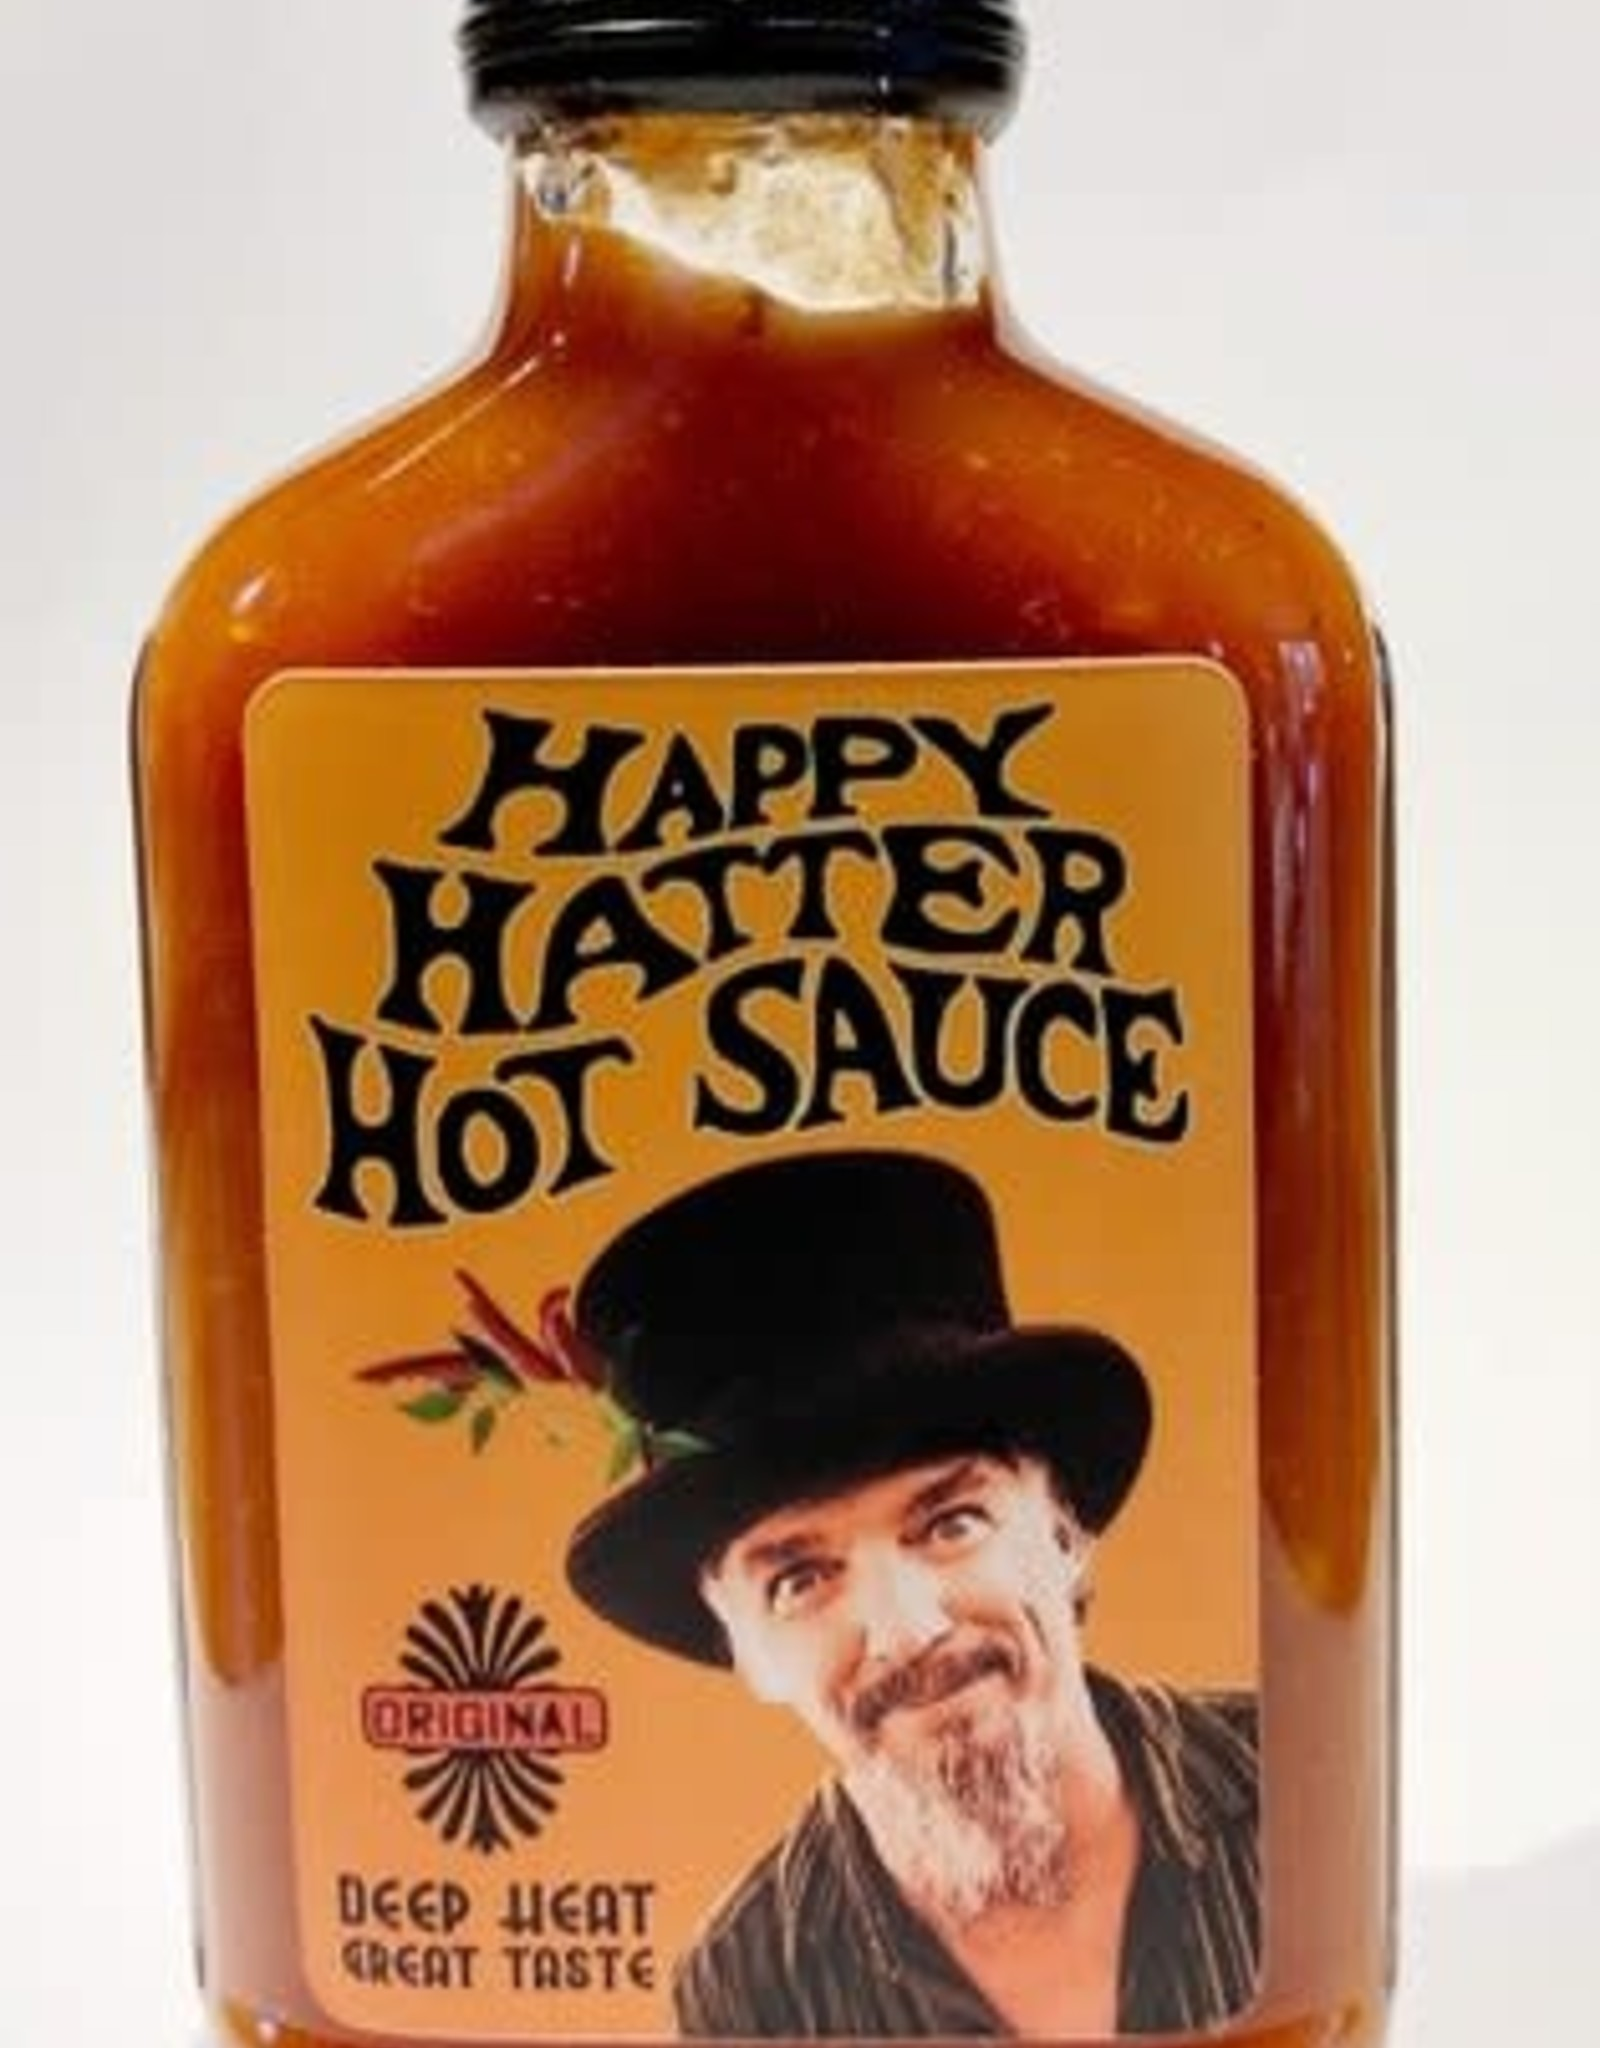 Happy Hatter Hot Sauce Happy hatter hot sauce